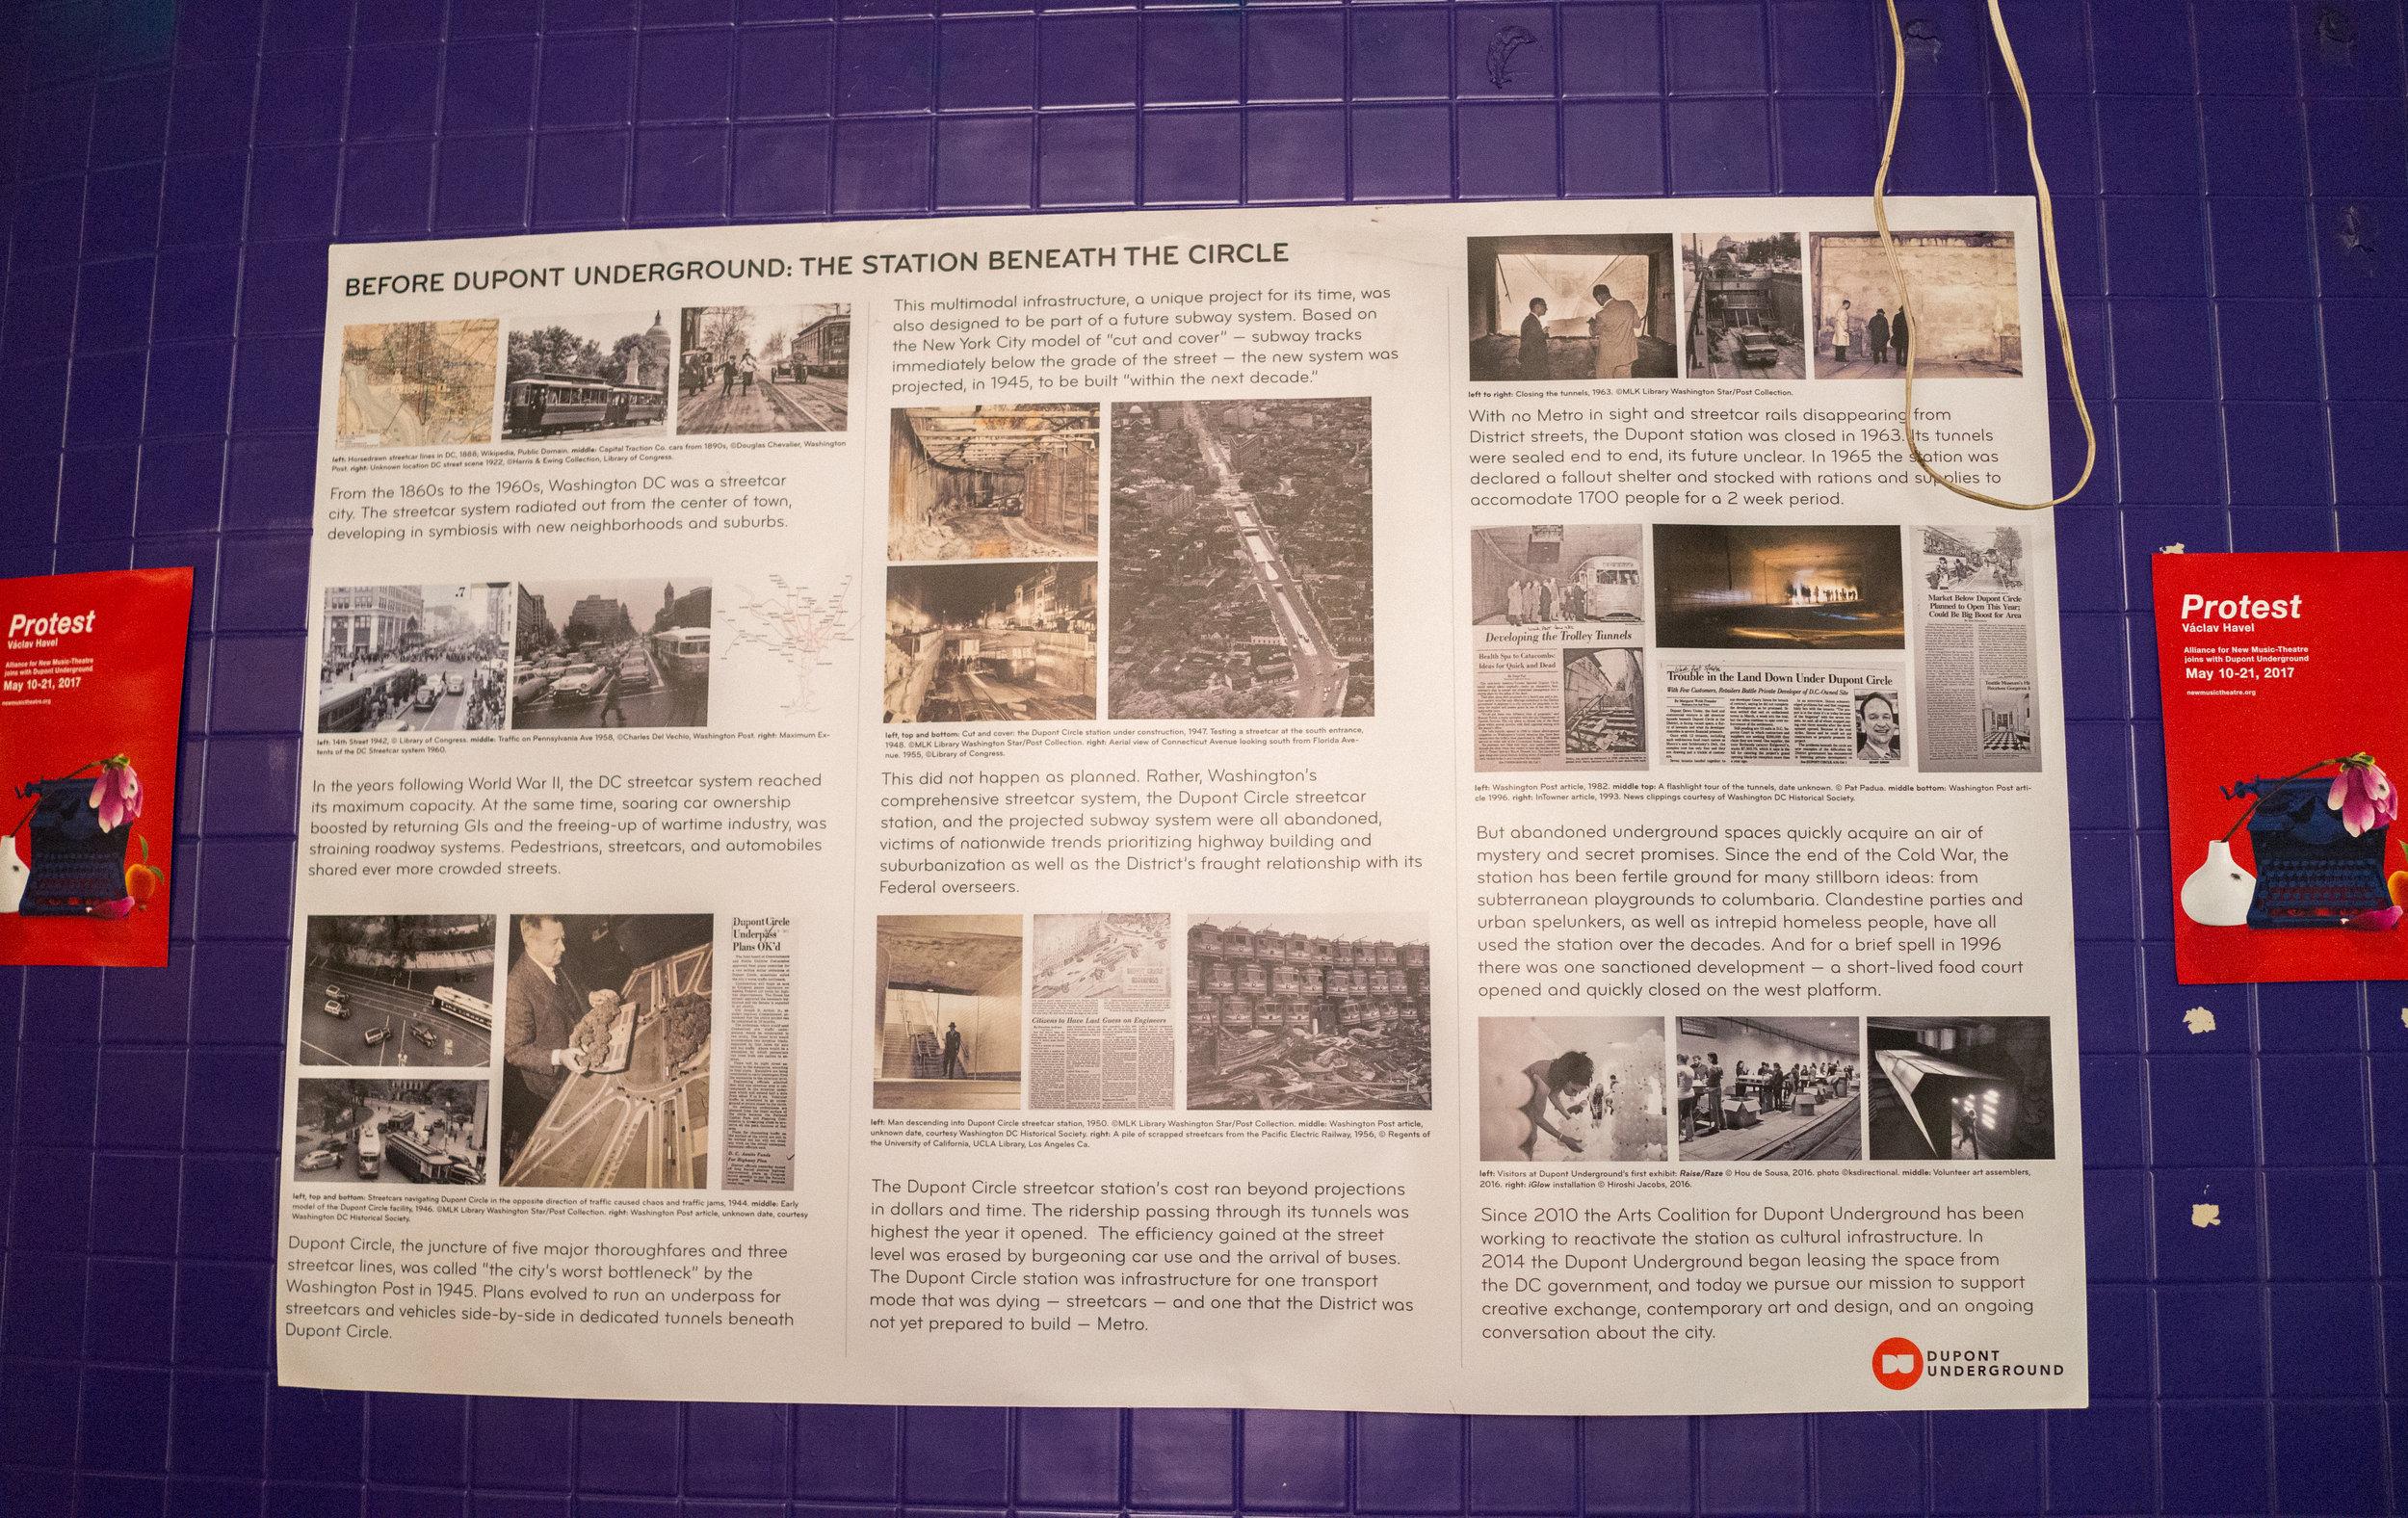 Dupont Underground History Poster